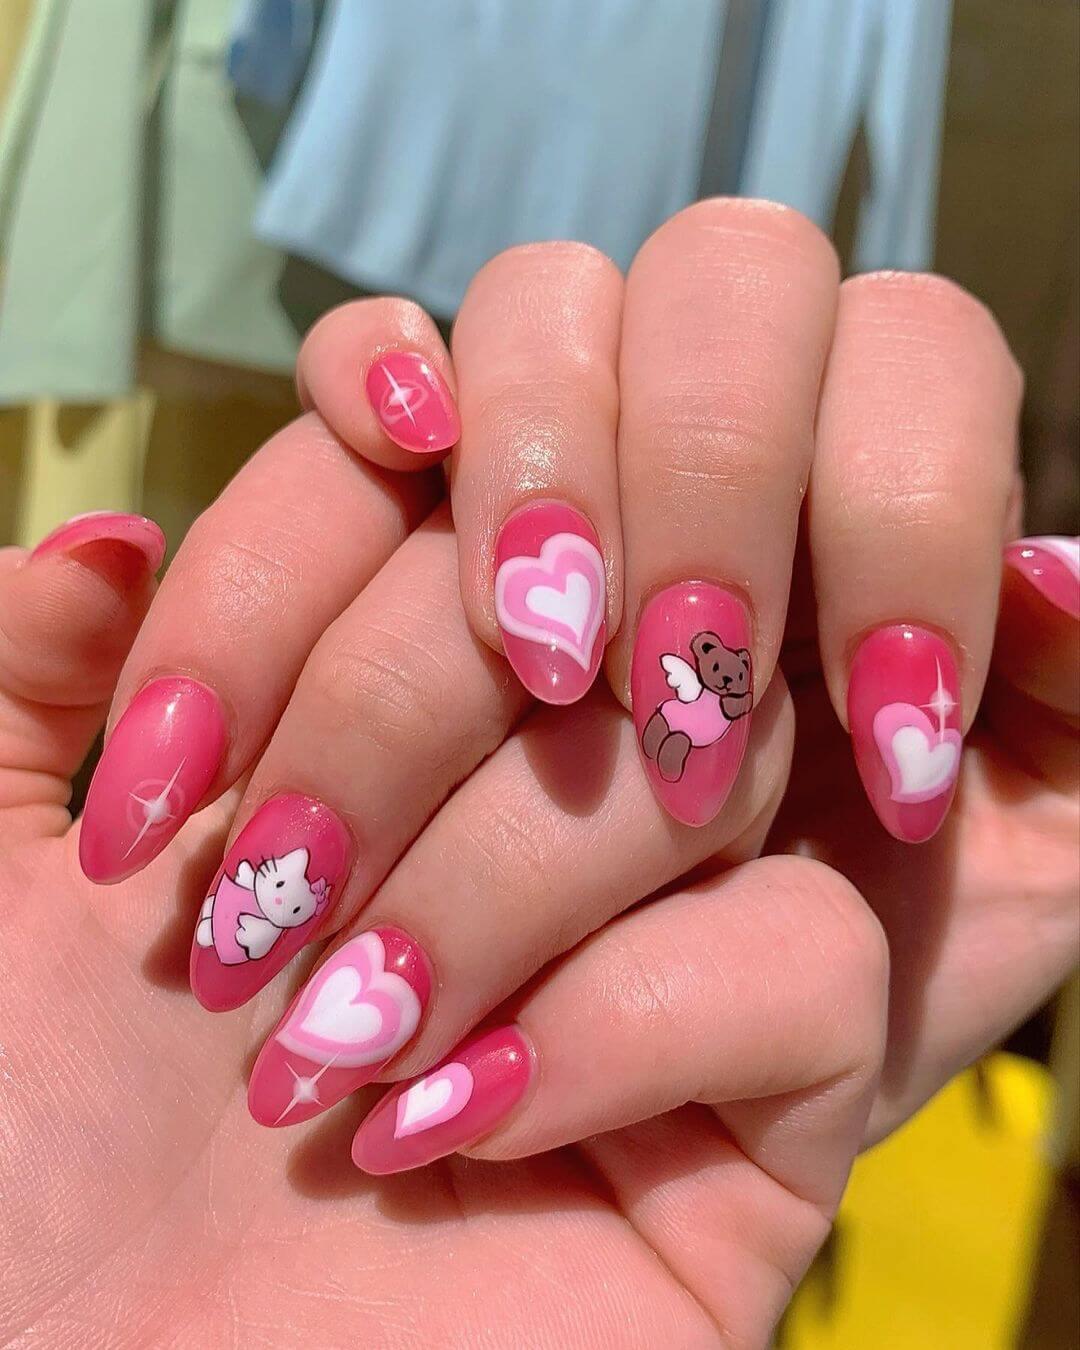 Hello Kitty Nail Art Design Hello Kitty with love in the stars